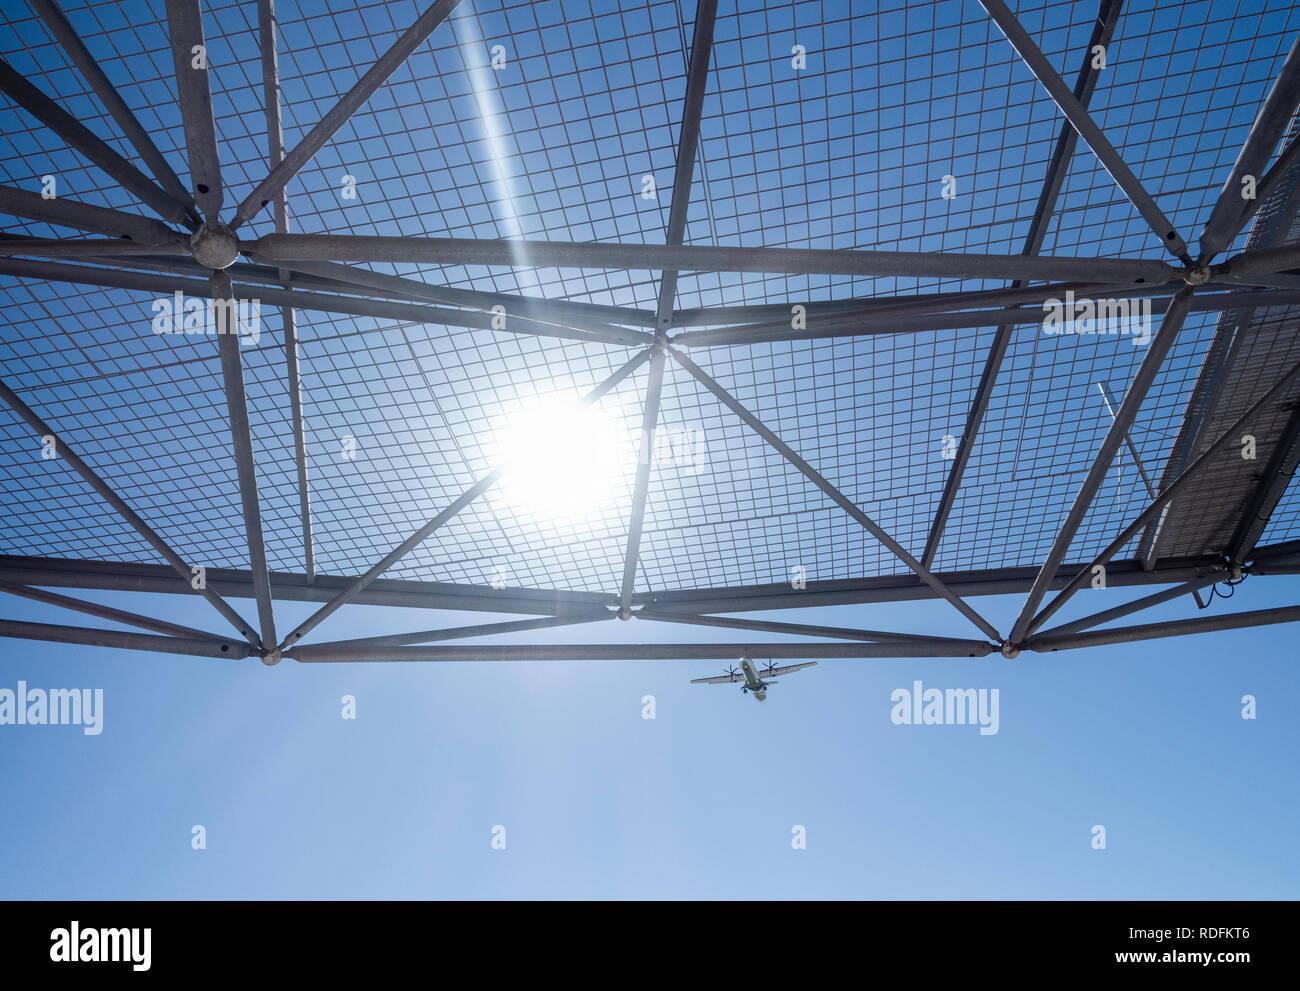 Airplane approaching runway. - Stock Image